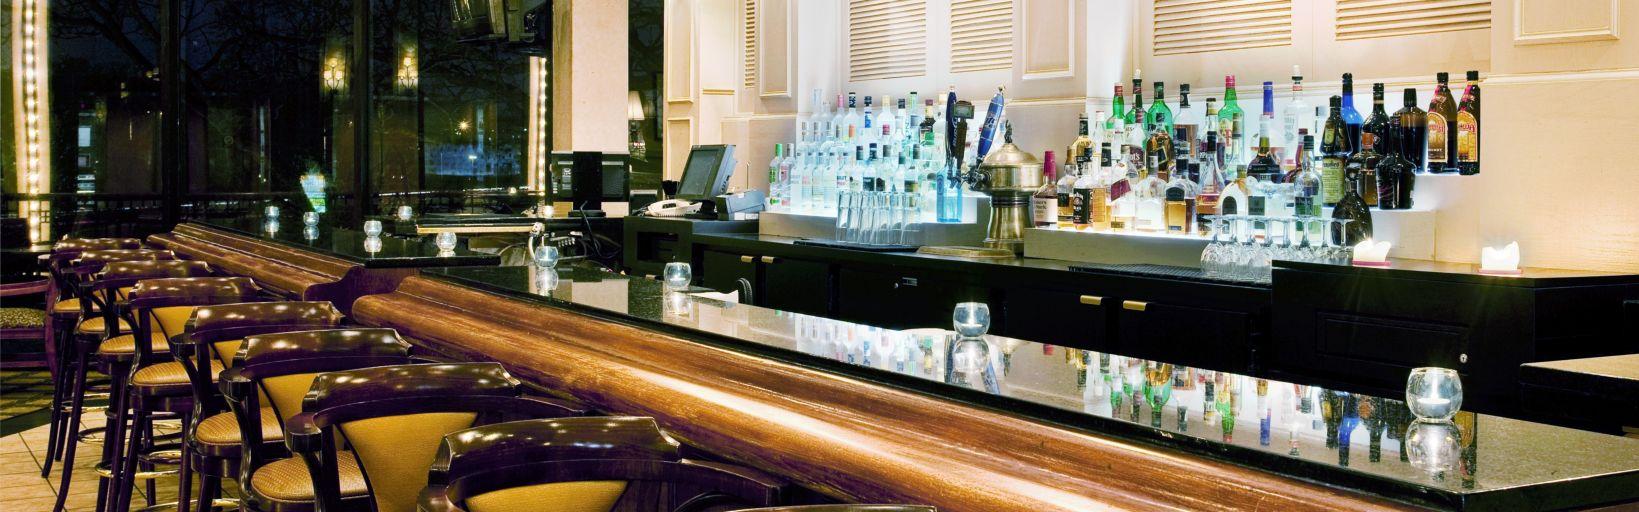 Restaurants Near Holiday Inn Chicago Nw Crystal Lk Conv Ctr